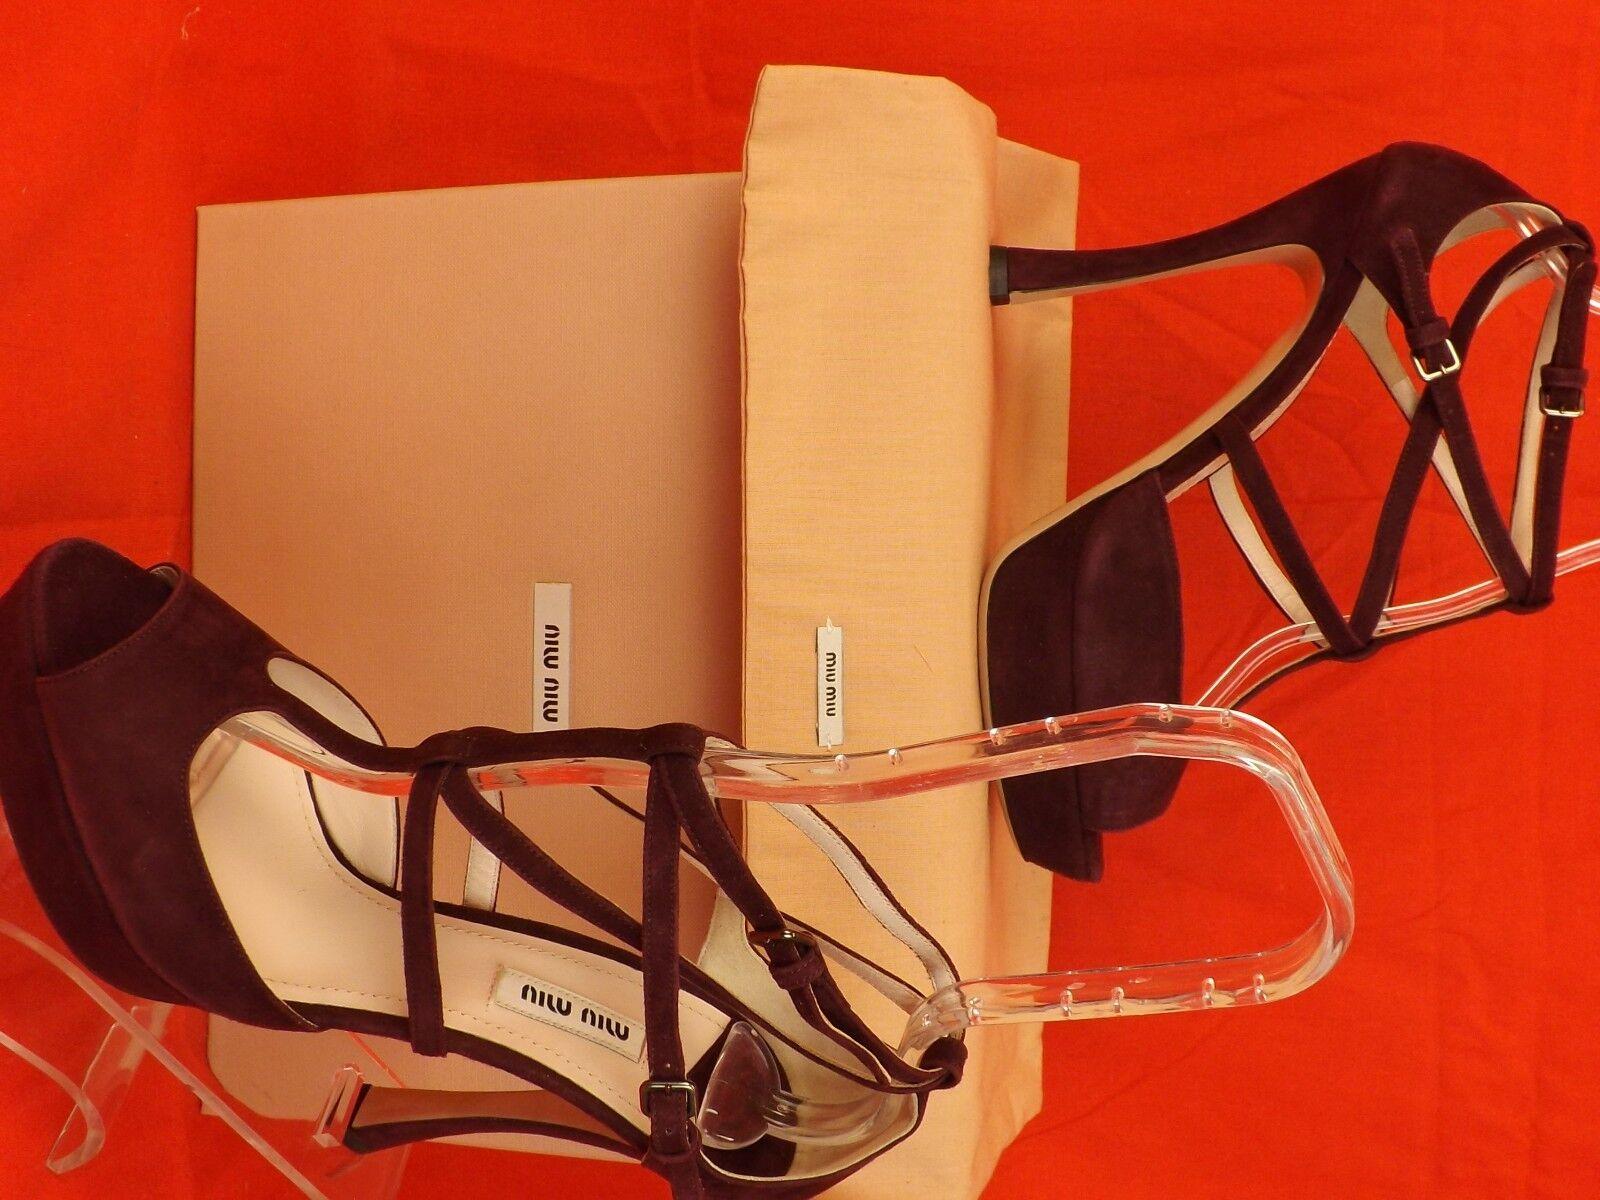 NIB MIU MIU PRADA BURGUNDY SUEDE CAGED ANKLE 35.5 STRAP PLATFORM HEEL SANDALS 35.5 ANKLE 7e424a